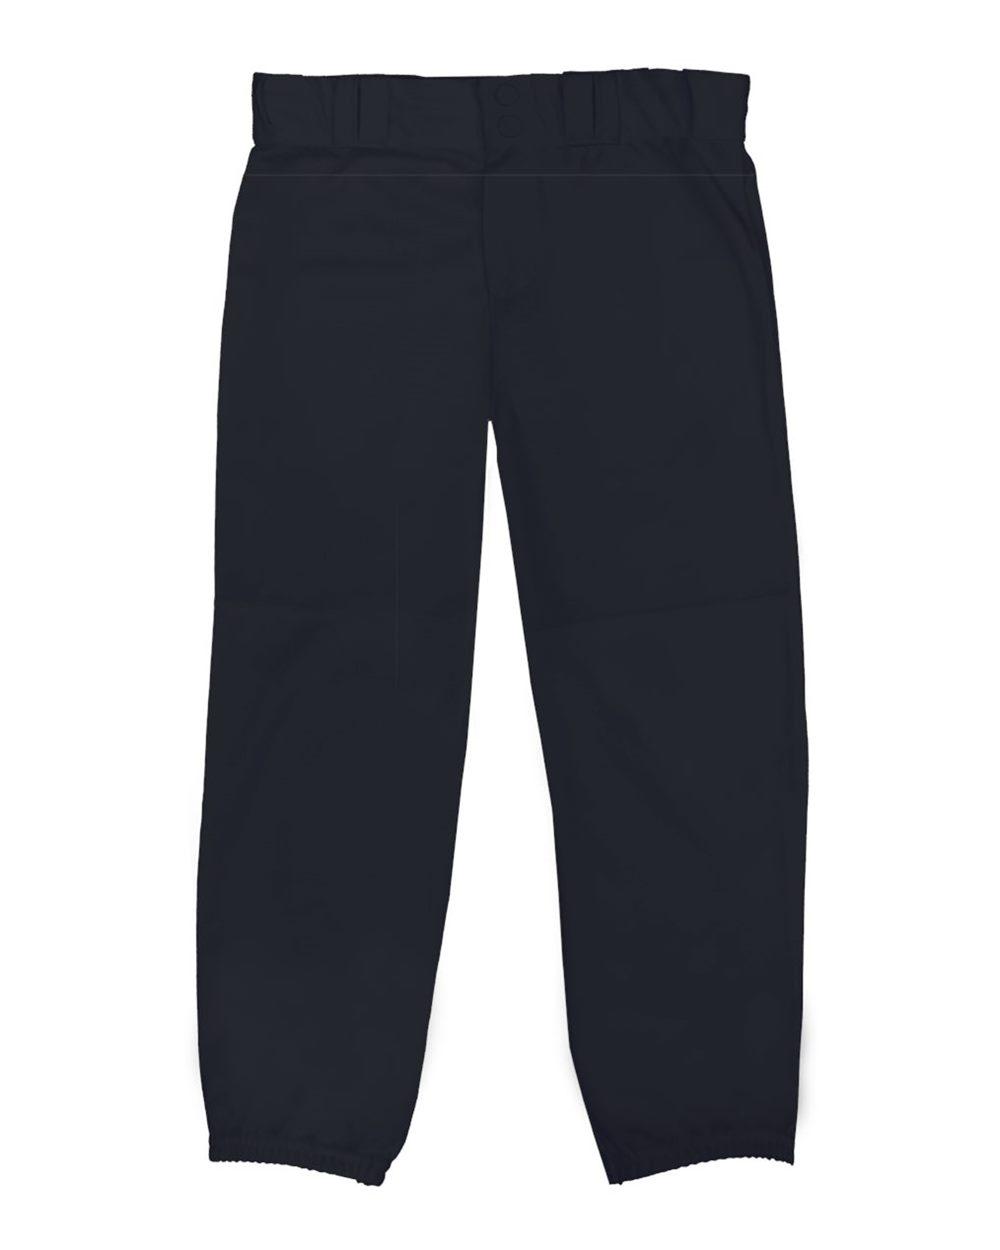 Big League Girl's Pants